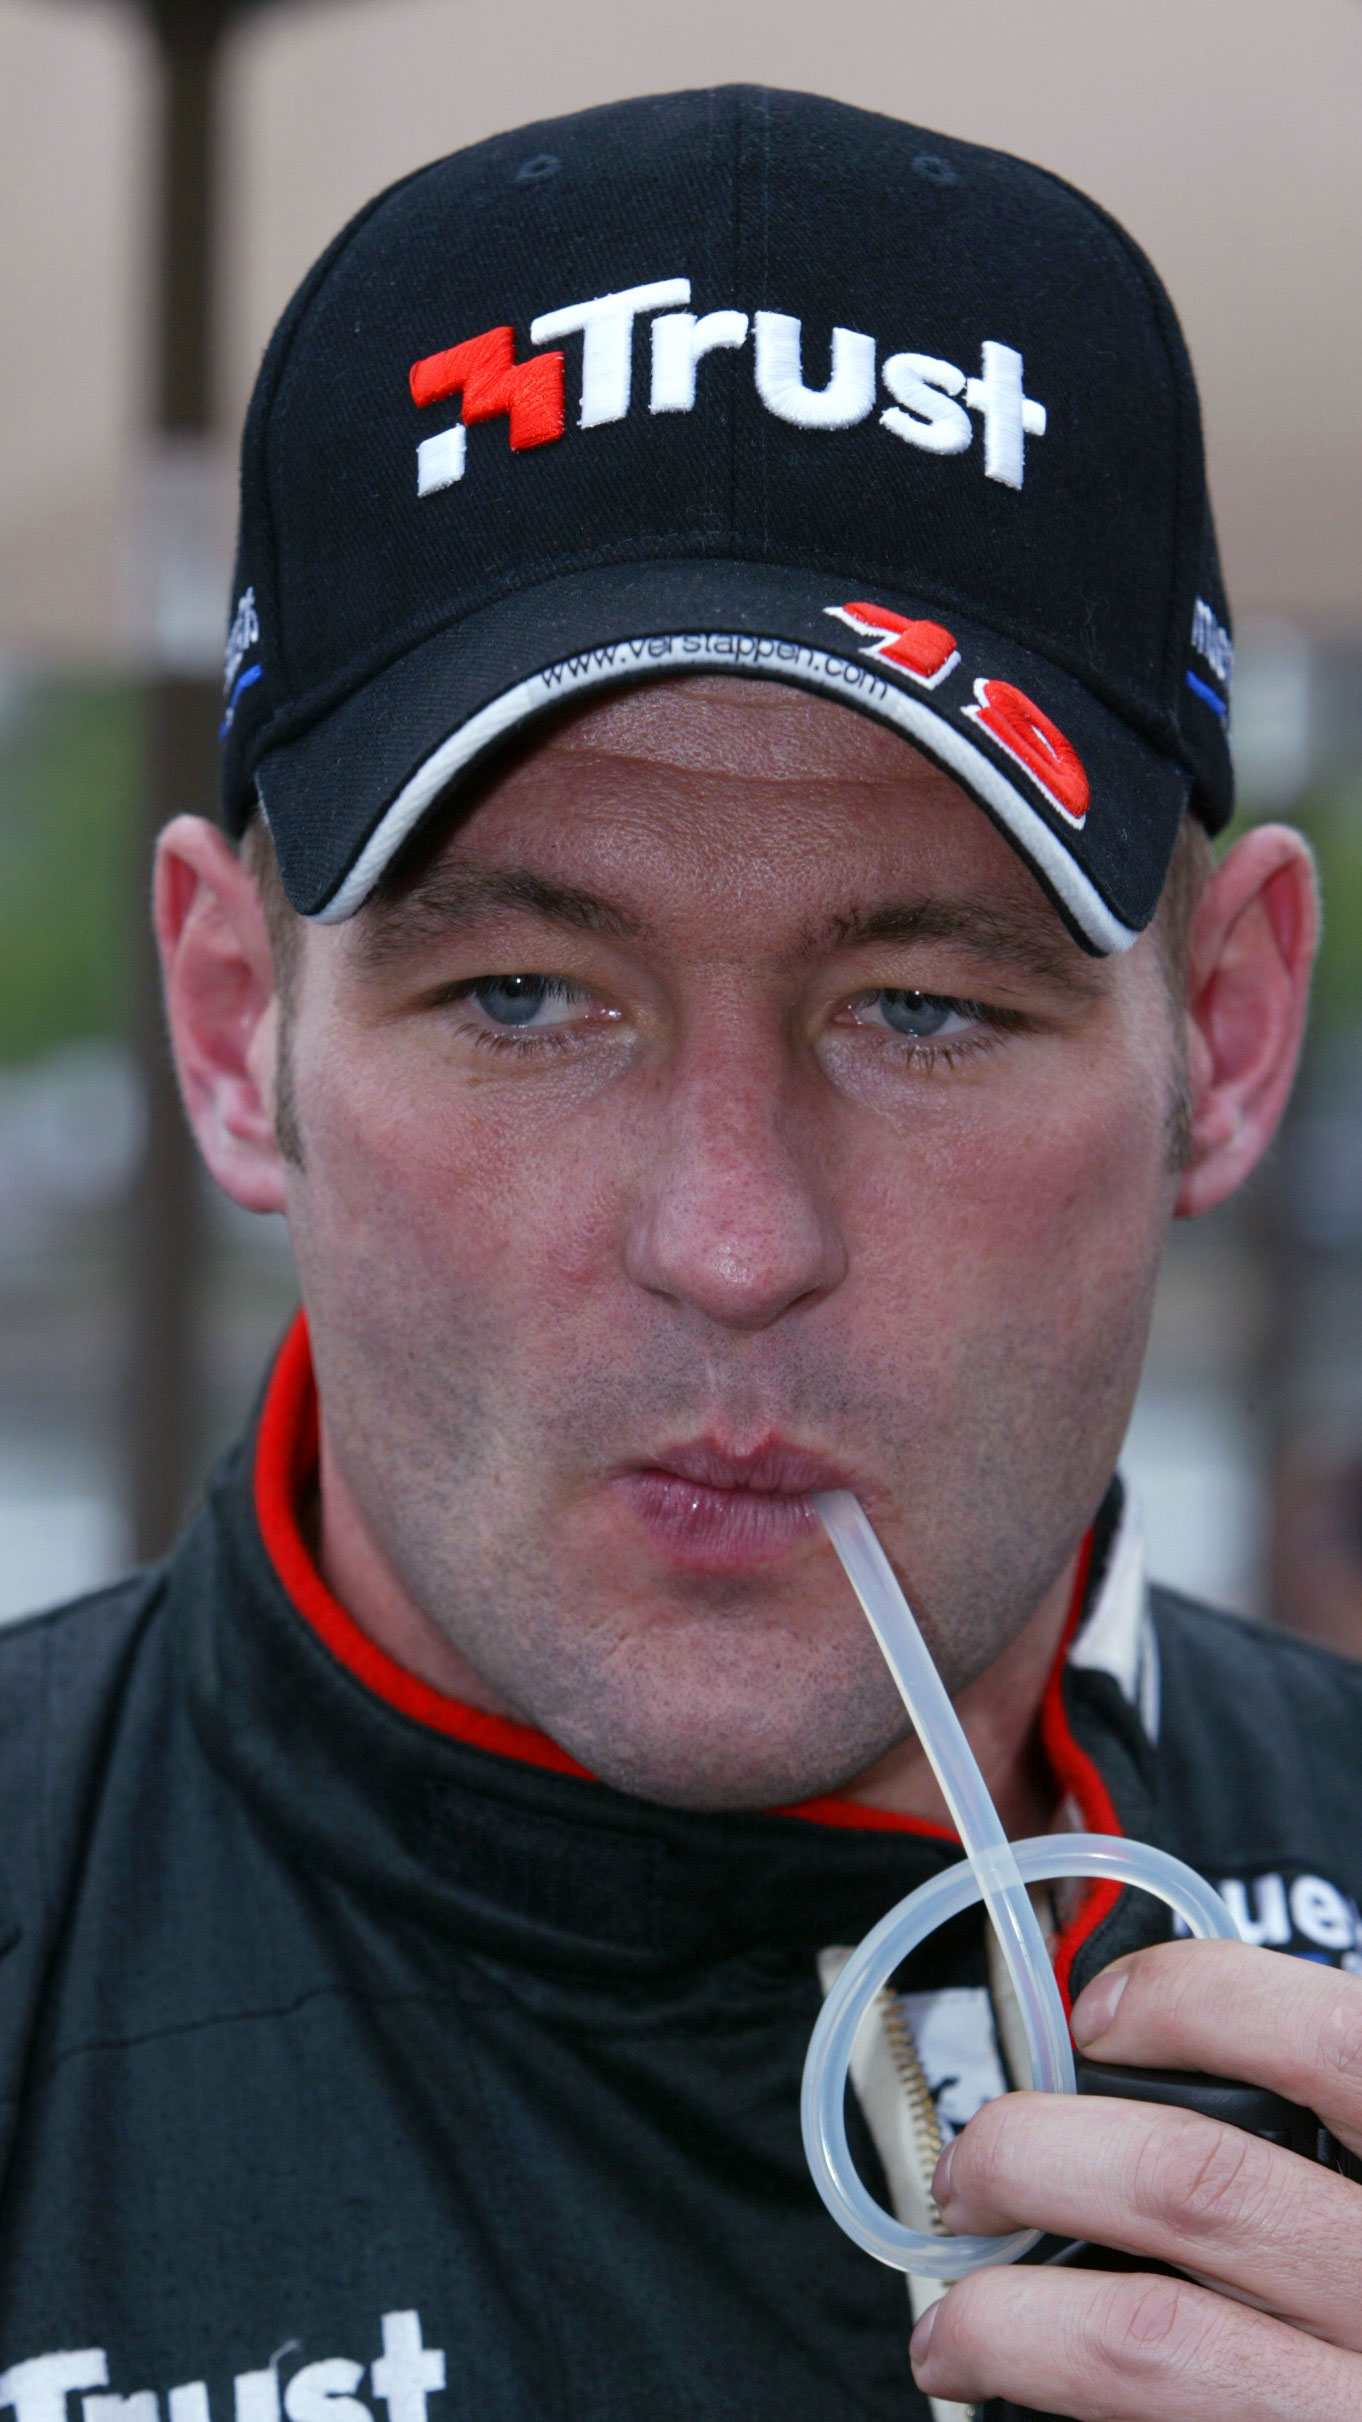 Jos Verstappen (WRI.net)